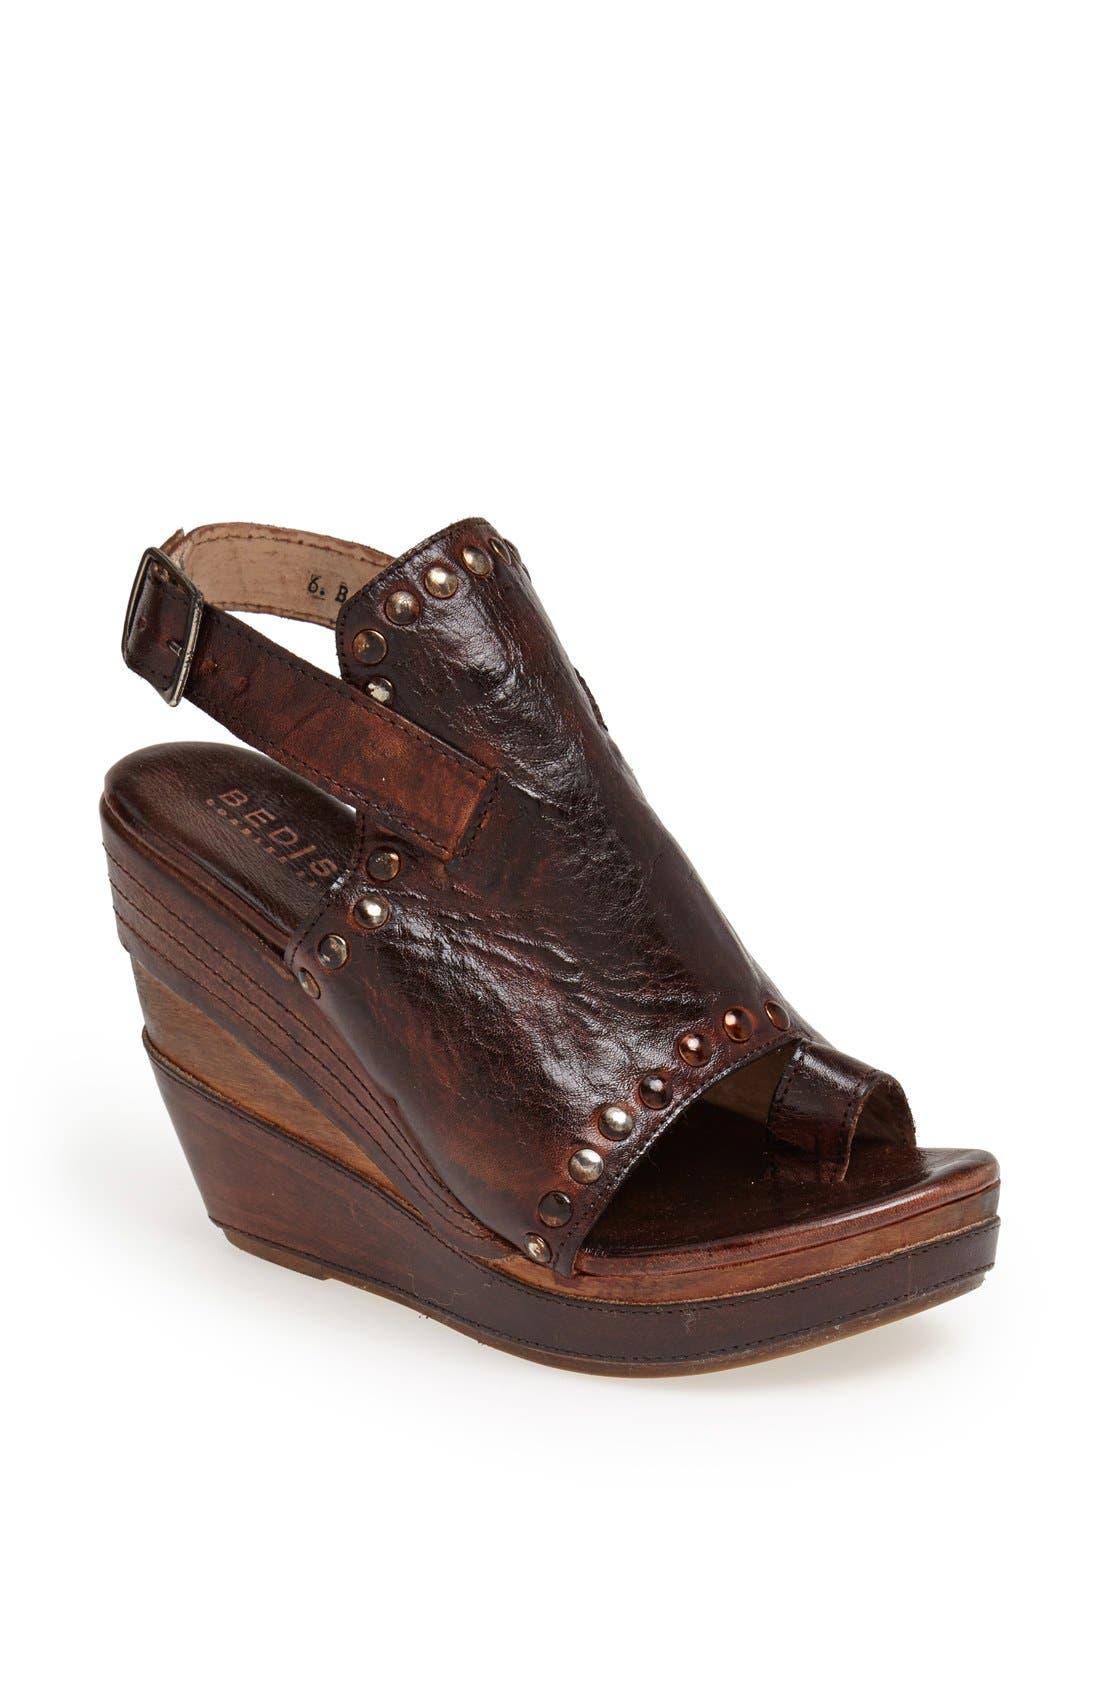 Main Image - Bed Stu 'Joann' Leather Sandal